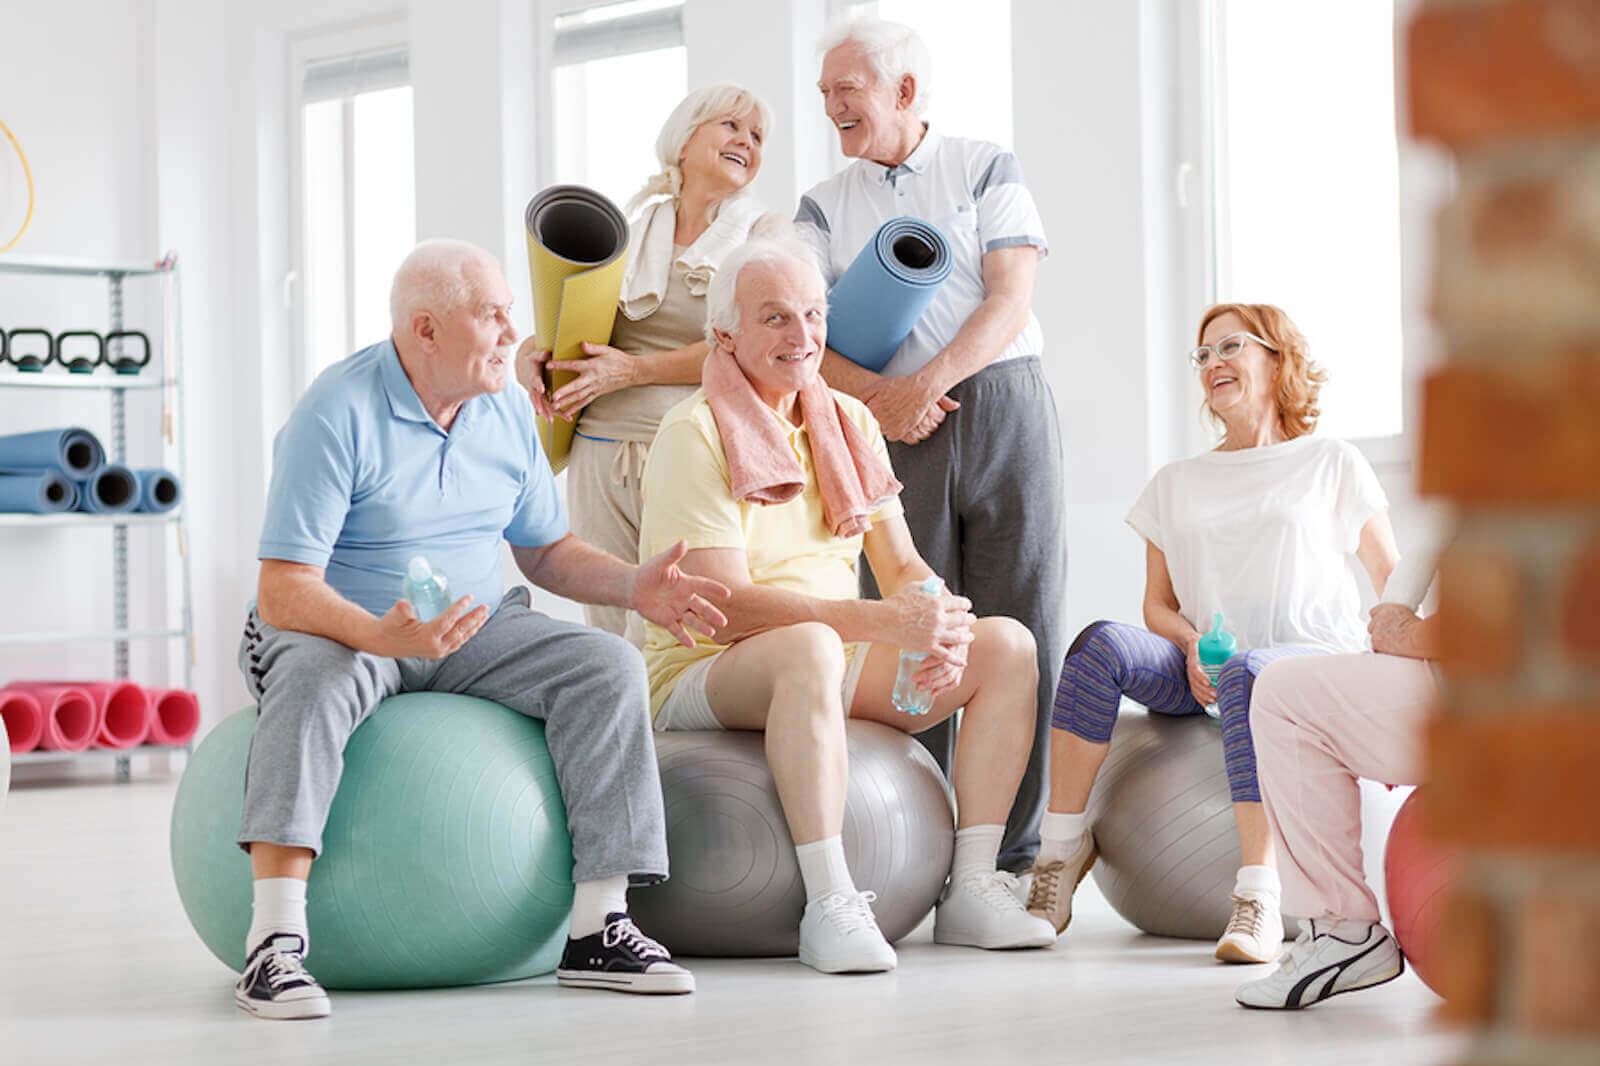 A group of seniors enjoying exercise together